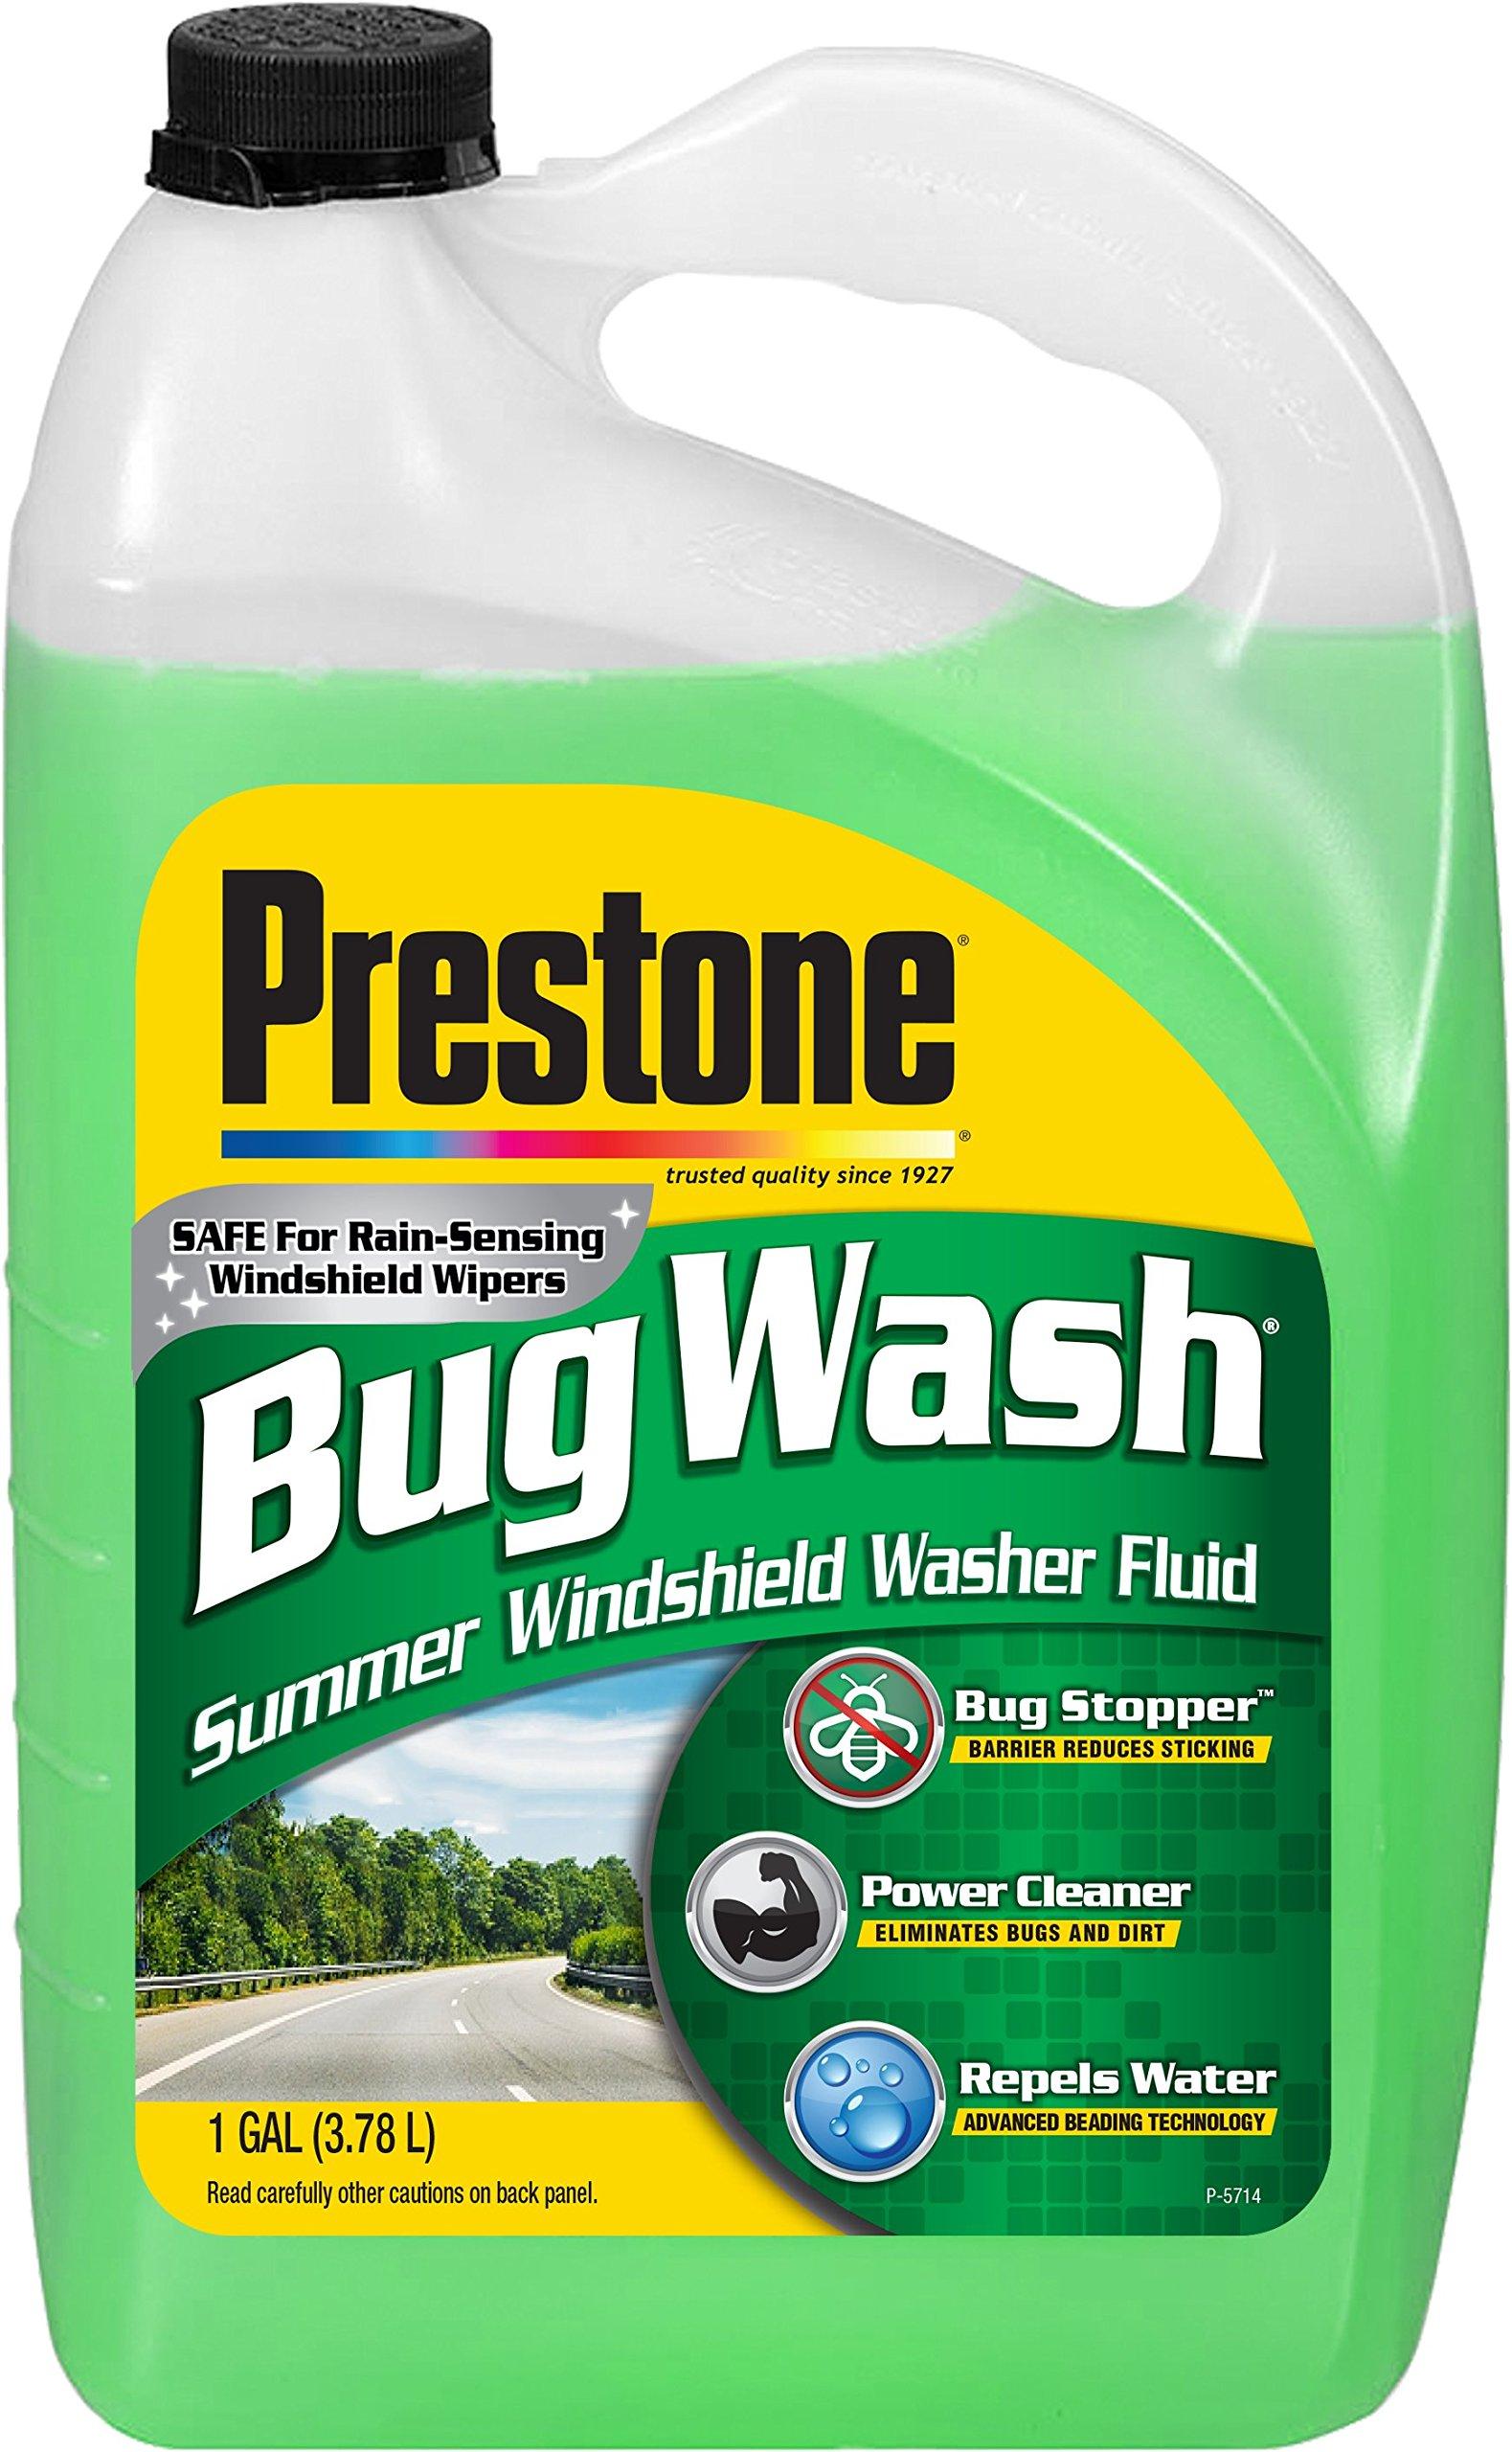 Prestone AS657-6PK Bug Wash Windshield Washer Fluid, 1 Gallon (Pack of 6)